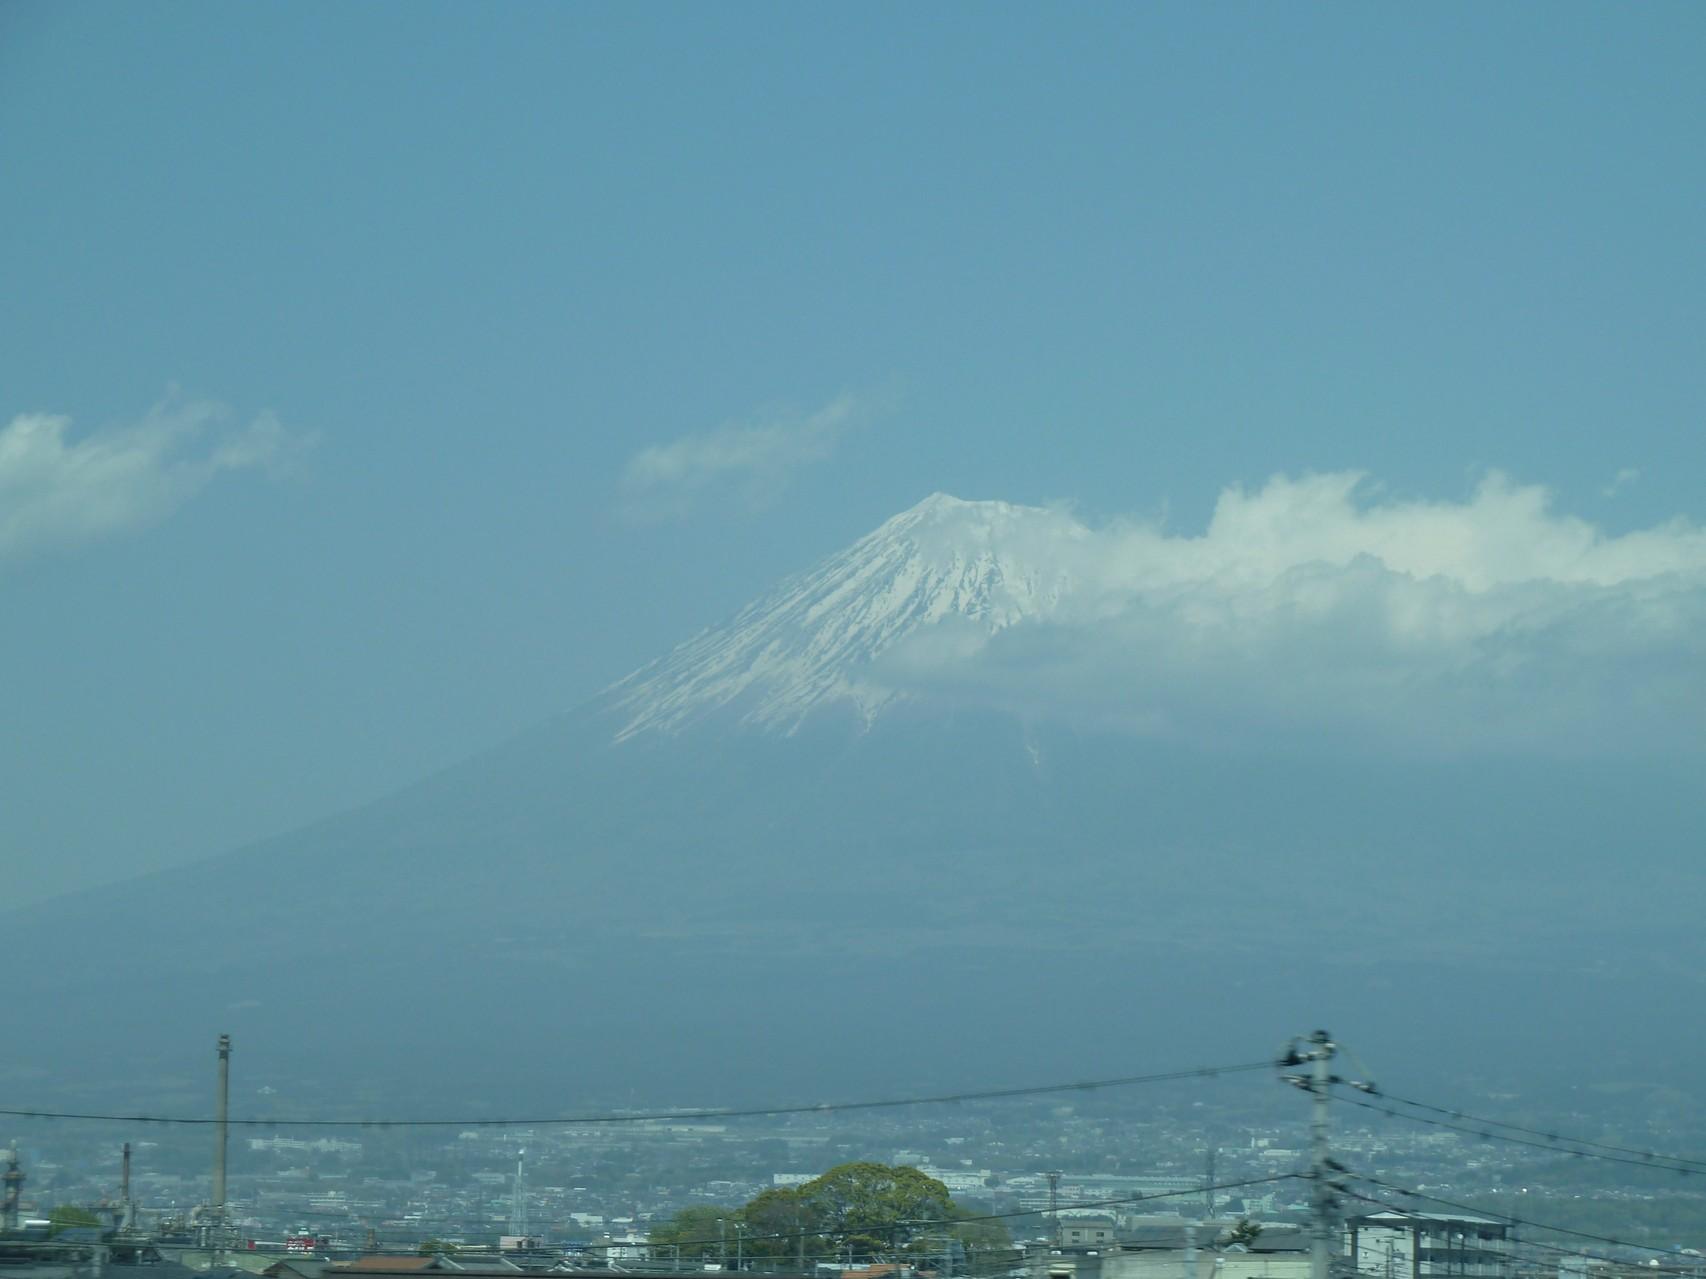 富士山 Fuji vom Shinkansen aus